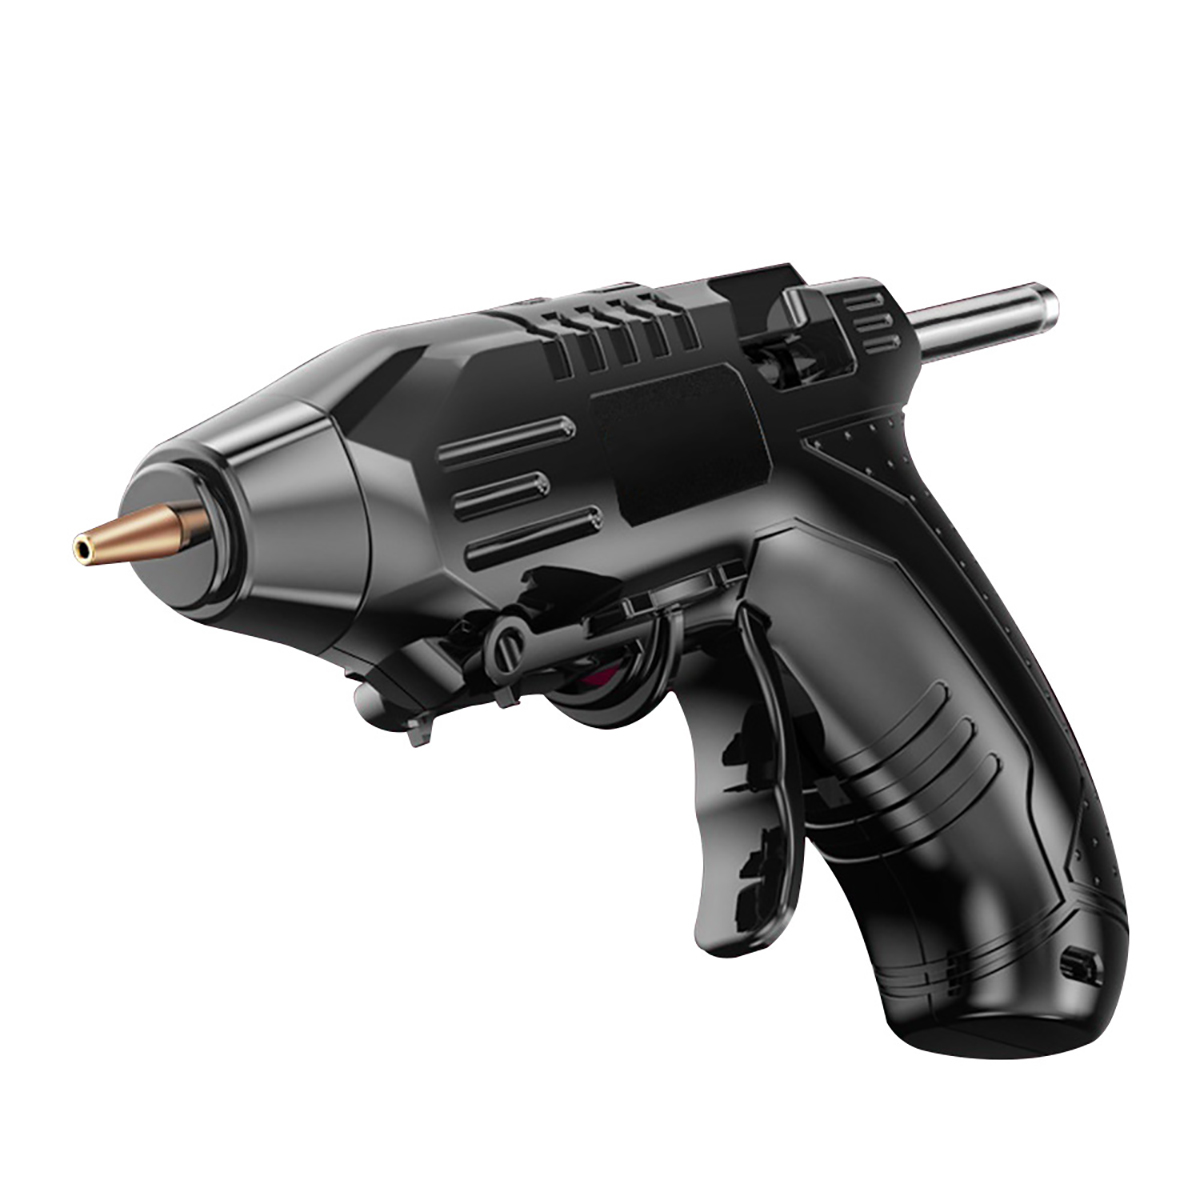 ML-HG2 3.6V Cordless DIY Hot Melt Glue G Un 1800mAh Li-ion Glue G Un Hand Craft Power Tool With Glue Sticks For Car Home Outdoor